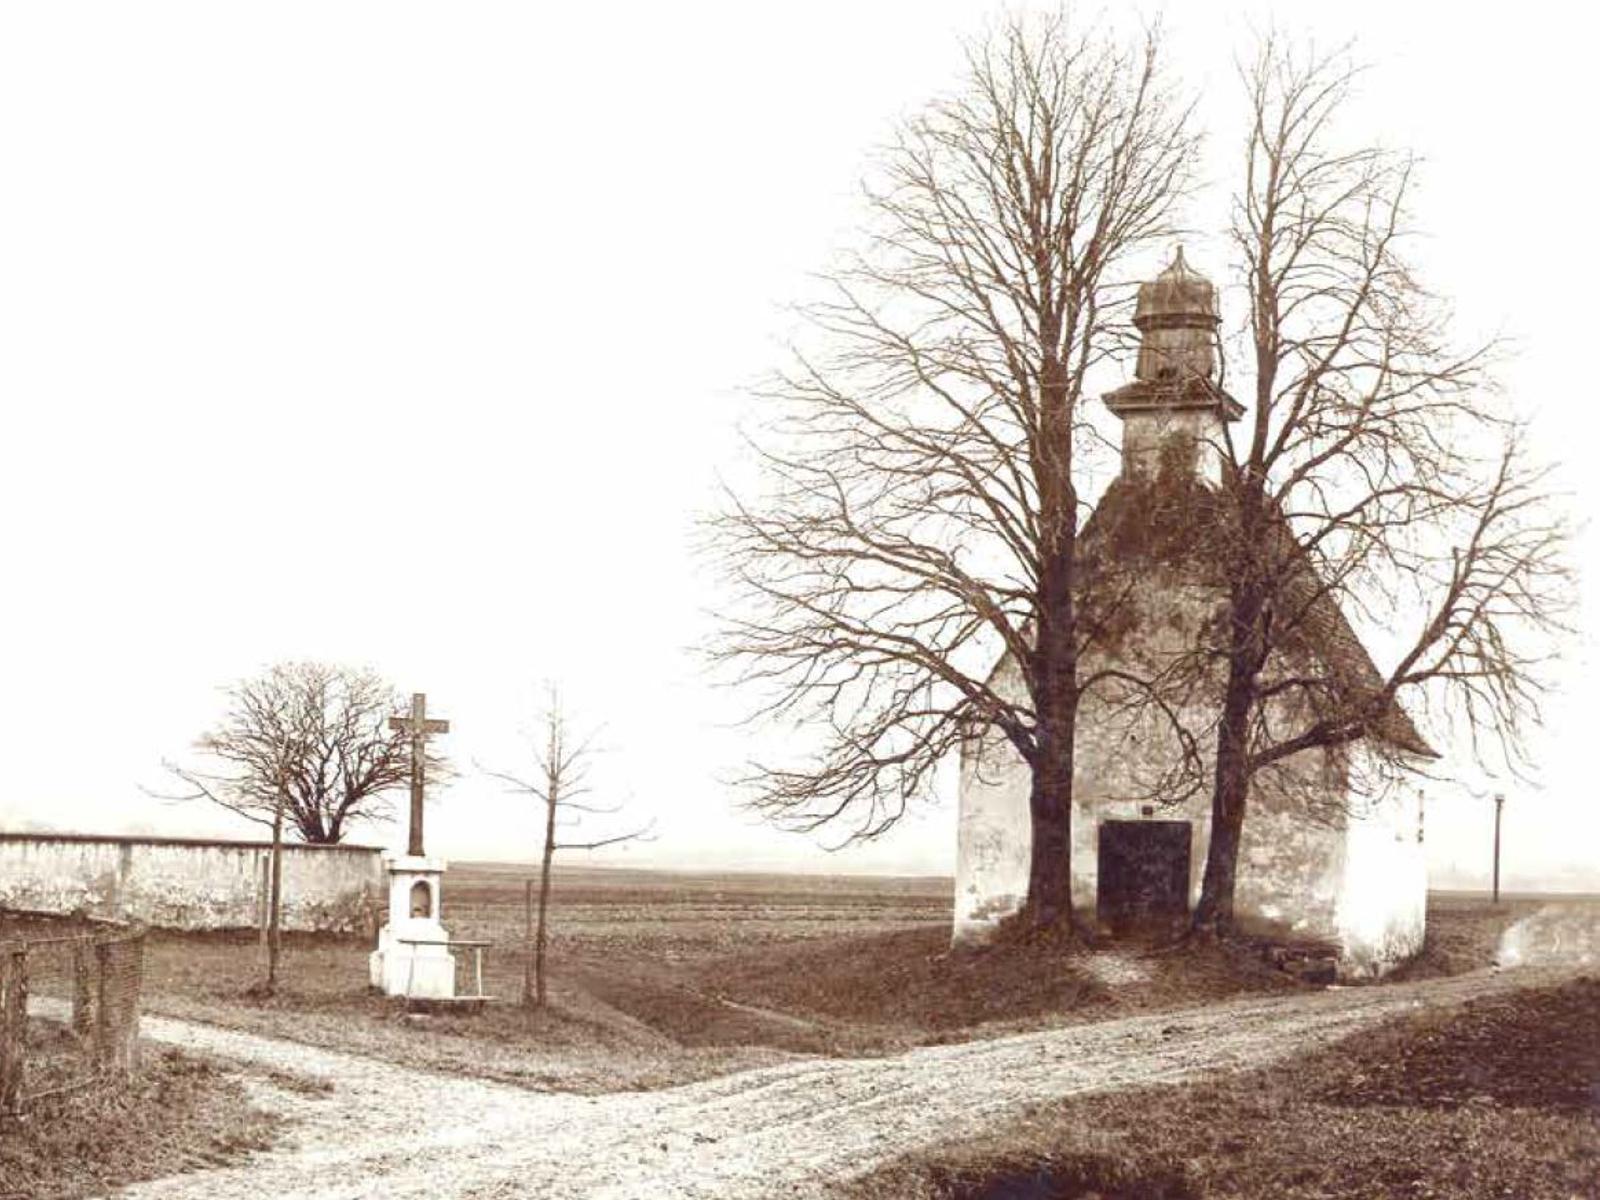 Station 13: St. Anna